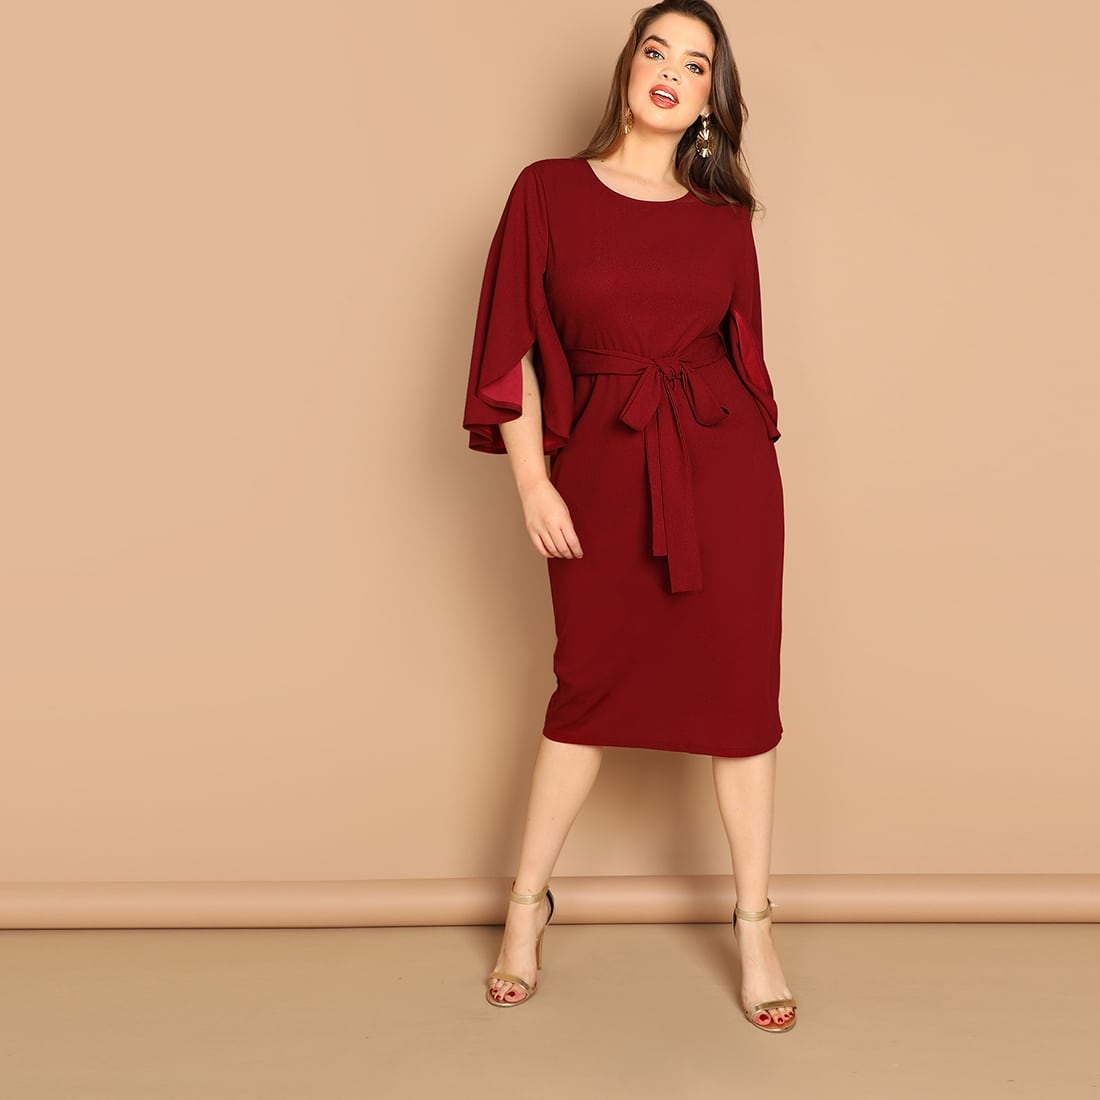 Bordeaux Elegant Vlak Grote maten jurken Split